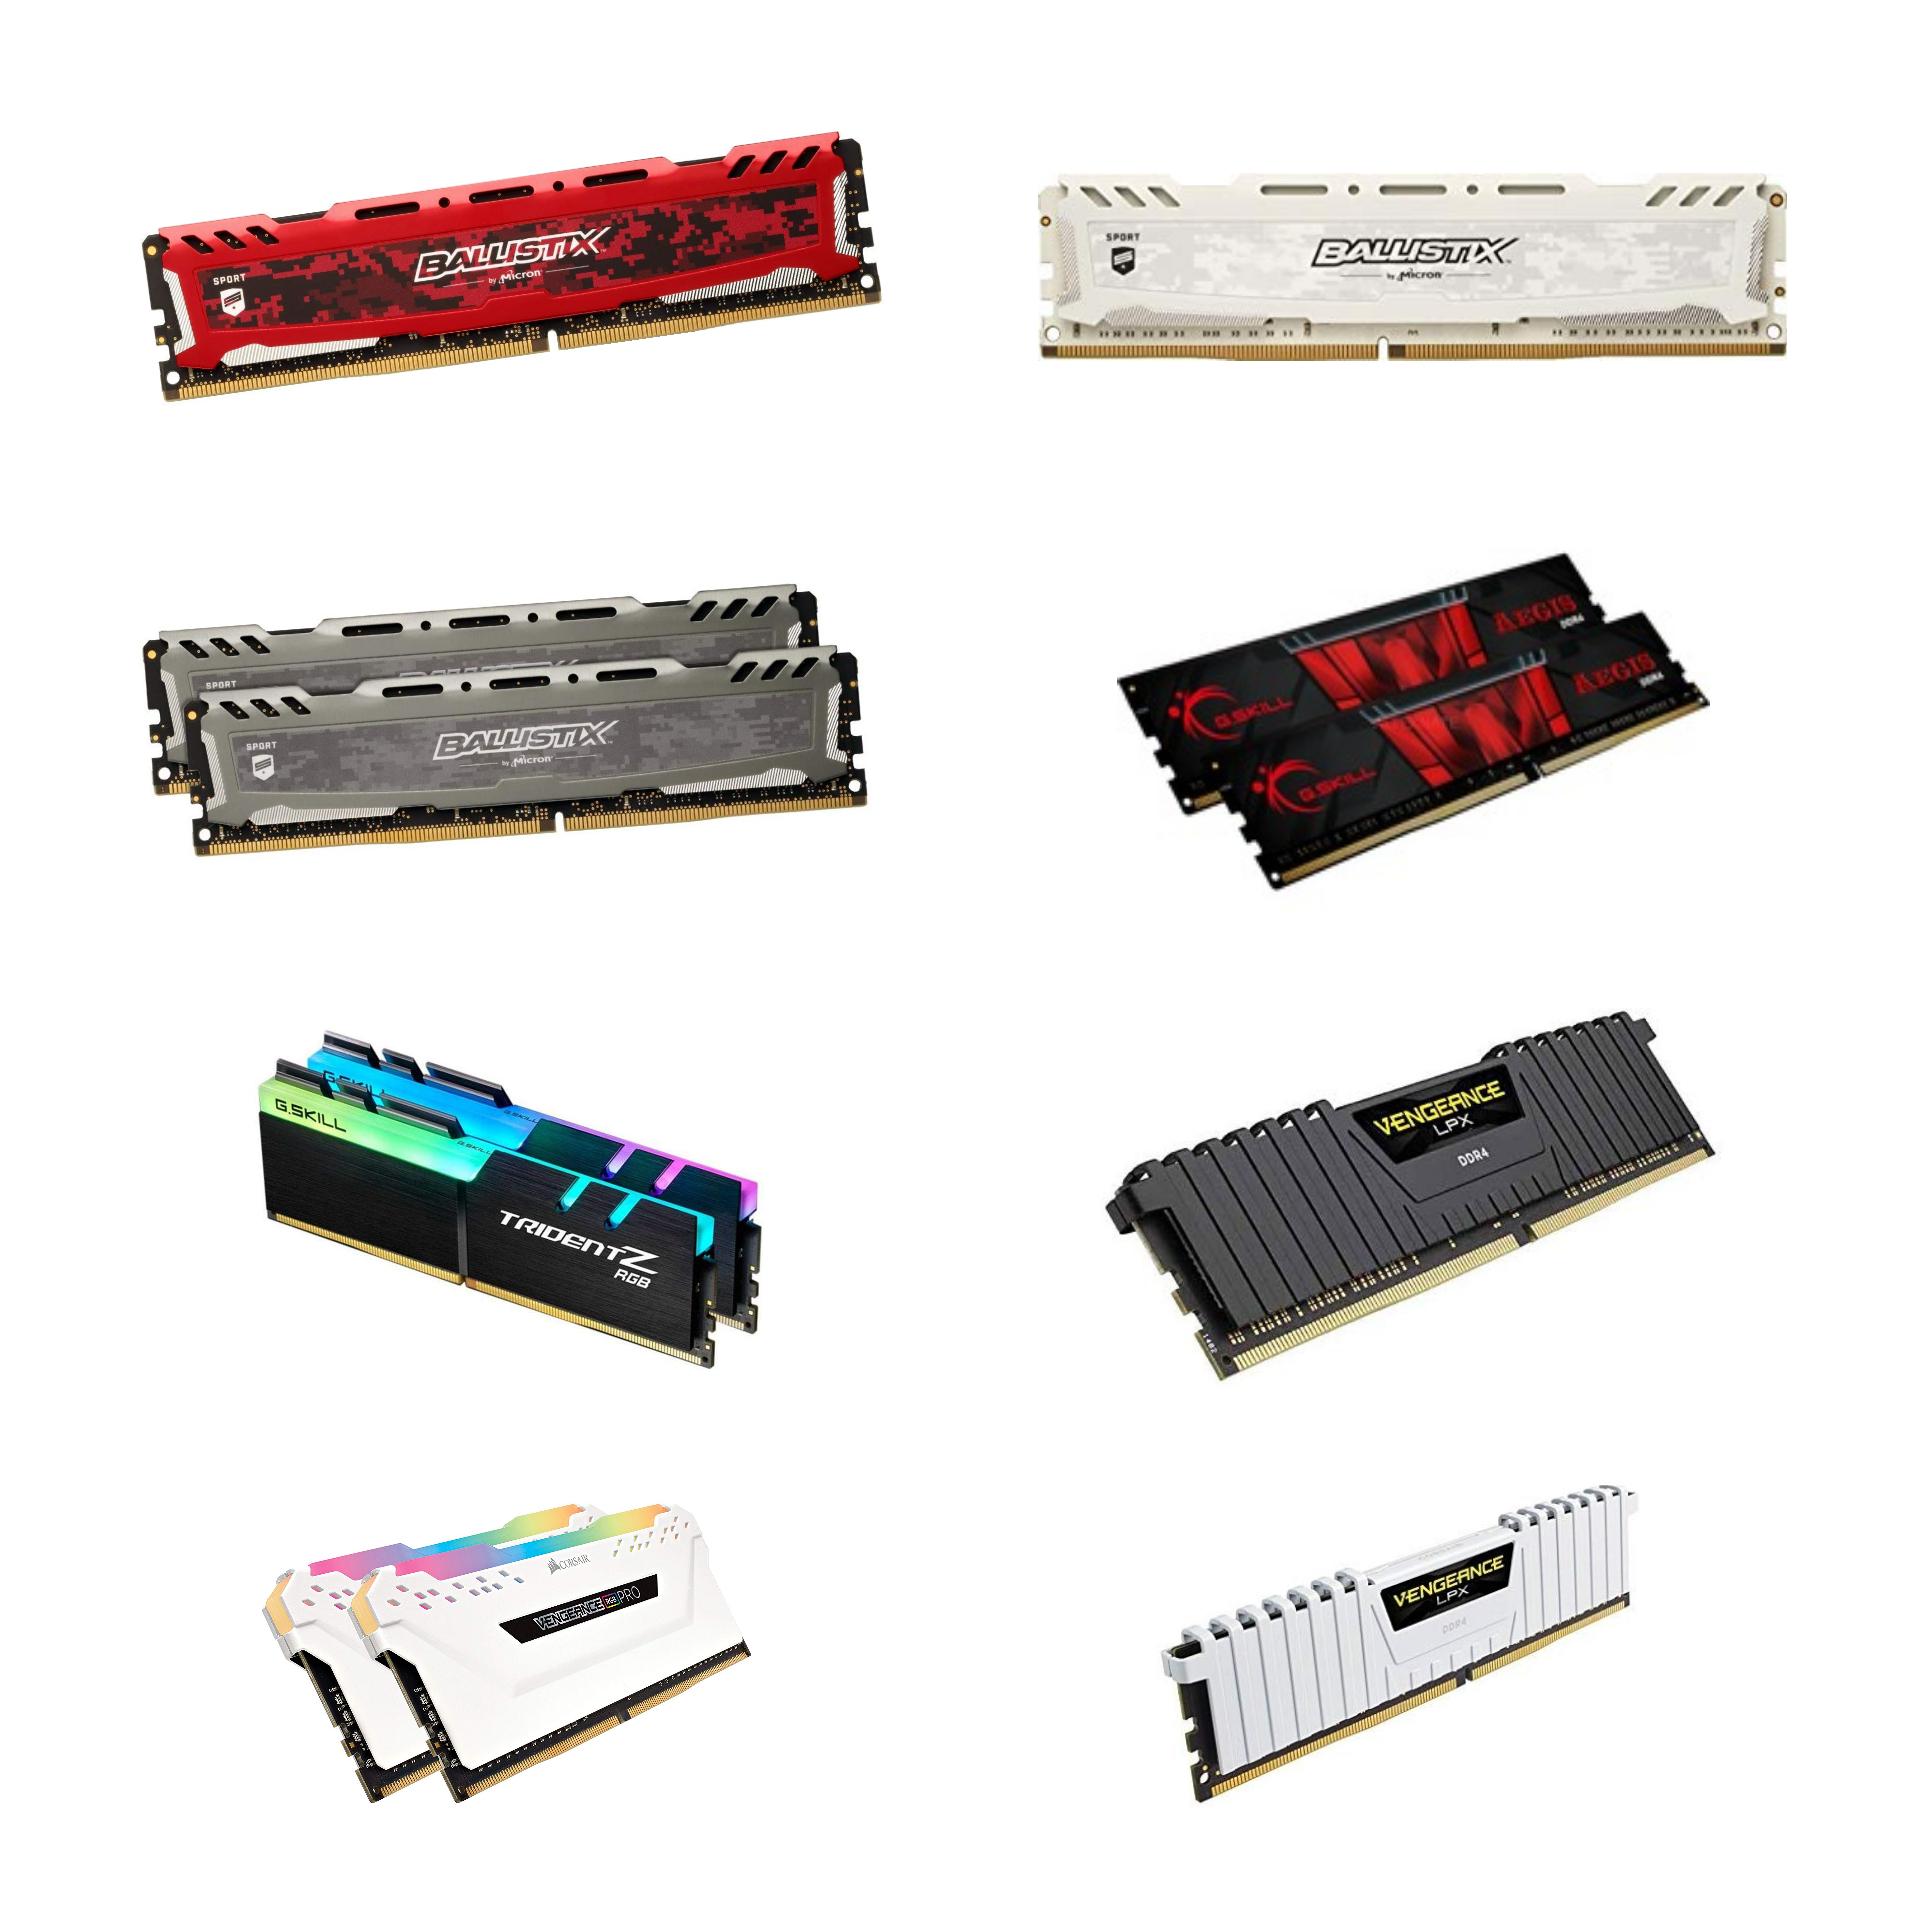 ¿Te hace falta RAM?